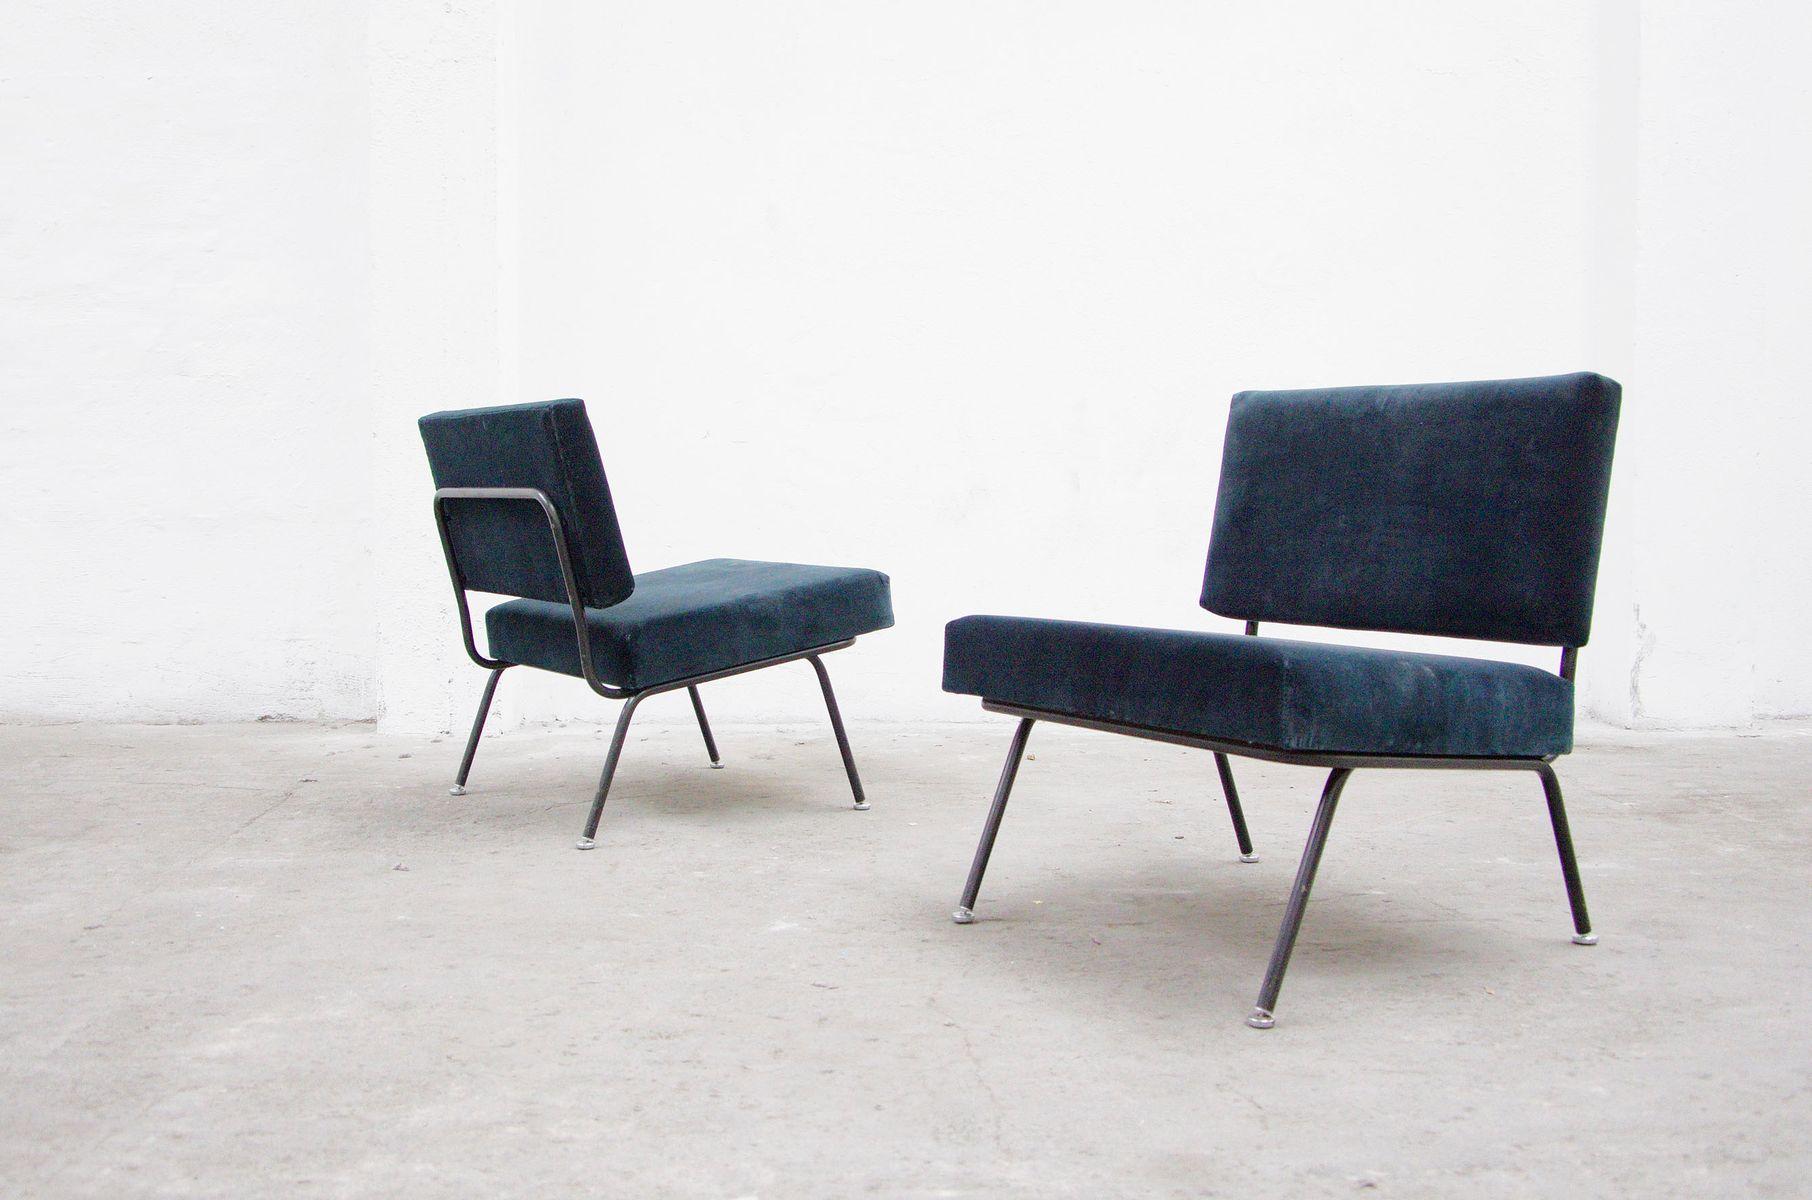 modell no 31 easy chair st hle von florence knoll f r knoll international 1956 2er set bei. Black Bedroom Furniture Sets. Home Design Ideas